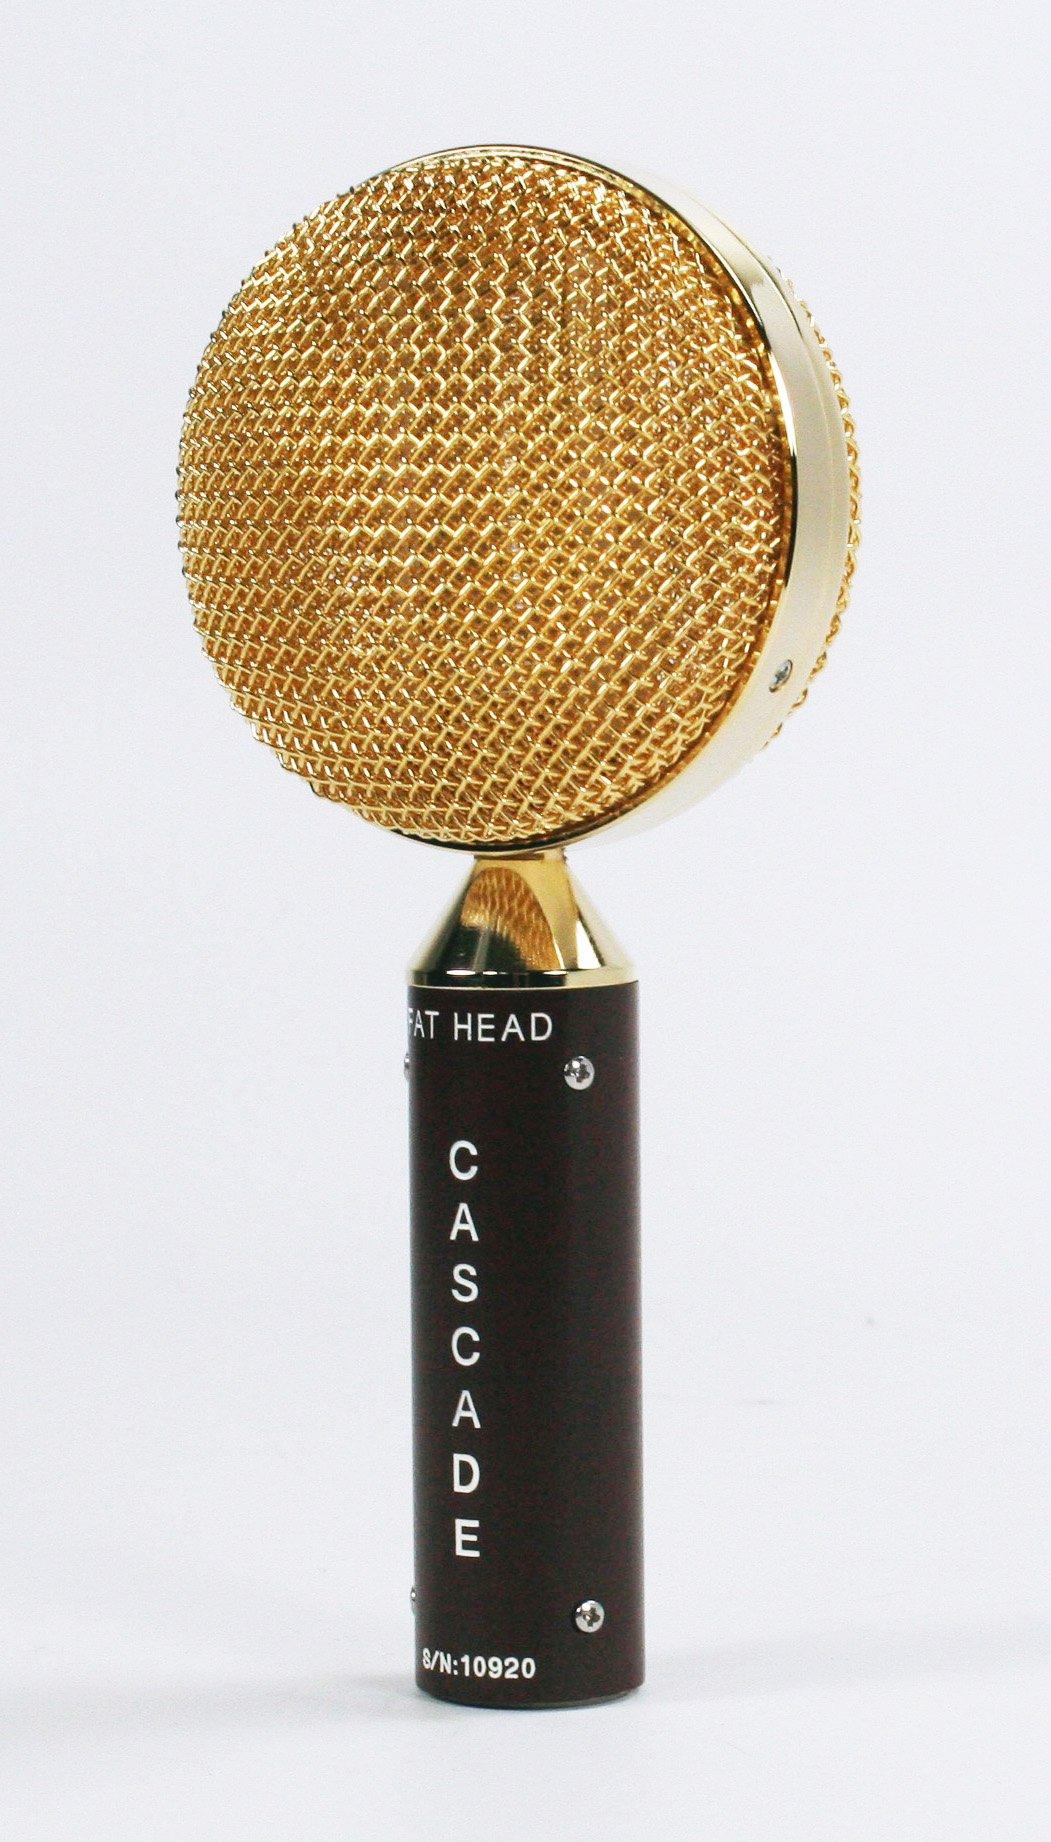 Cascade Microphones 98-G-A FAT HEAD Ribbon Microphone, Brown Body/Gold Grill by Cascade Microphones (Image #2)